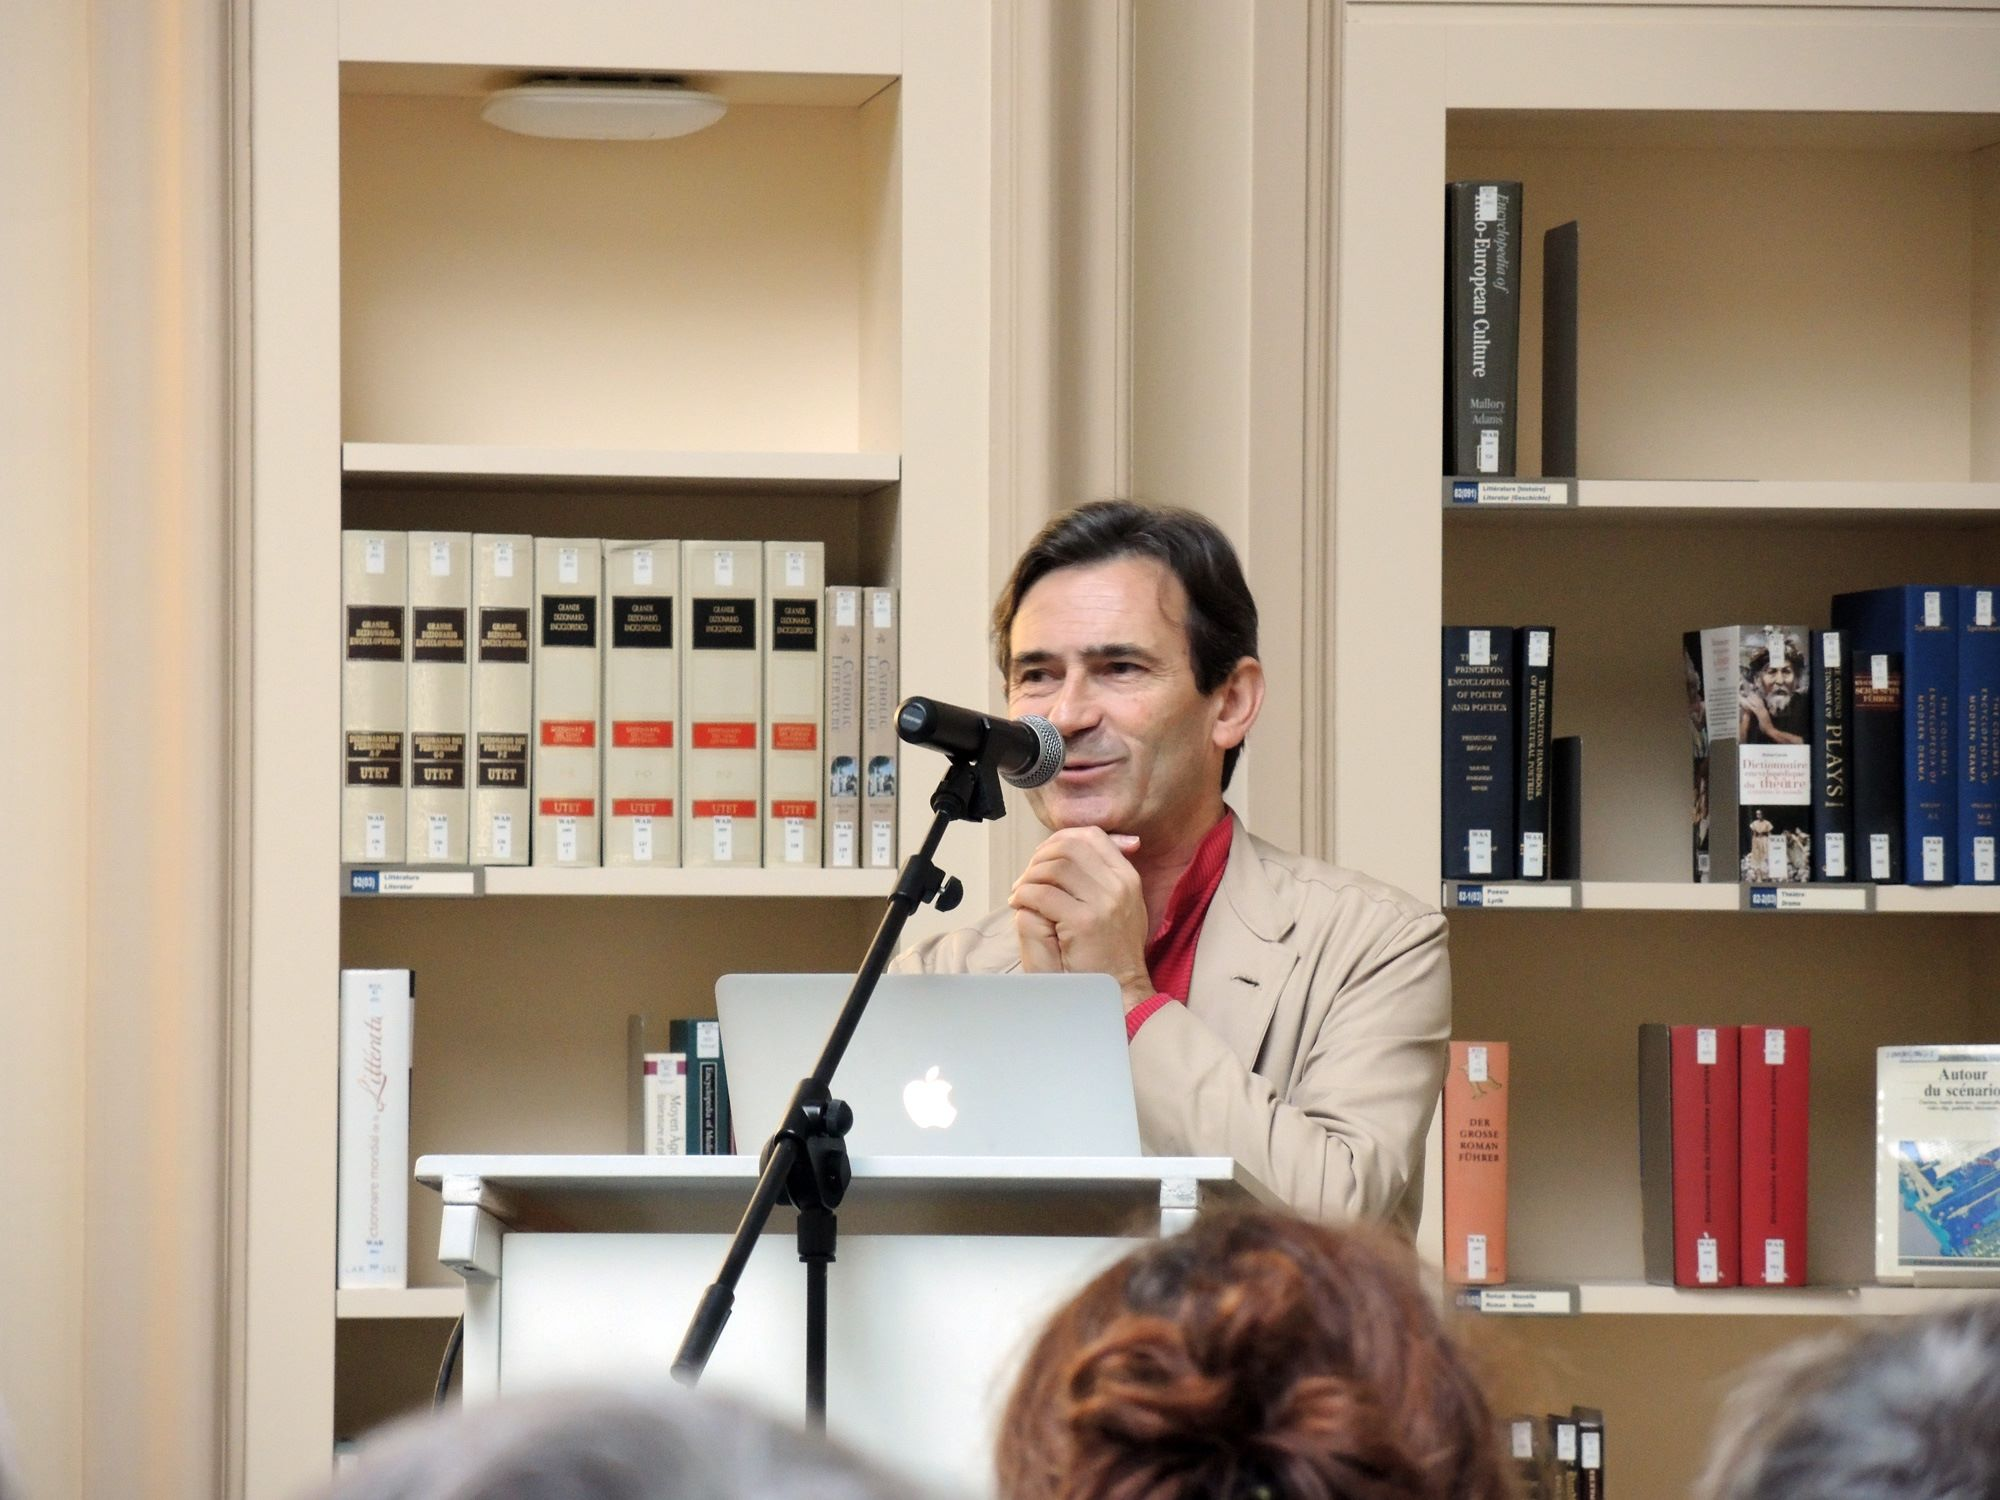 Benoît Peeters in Fribourg